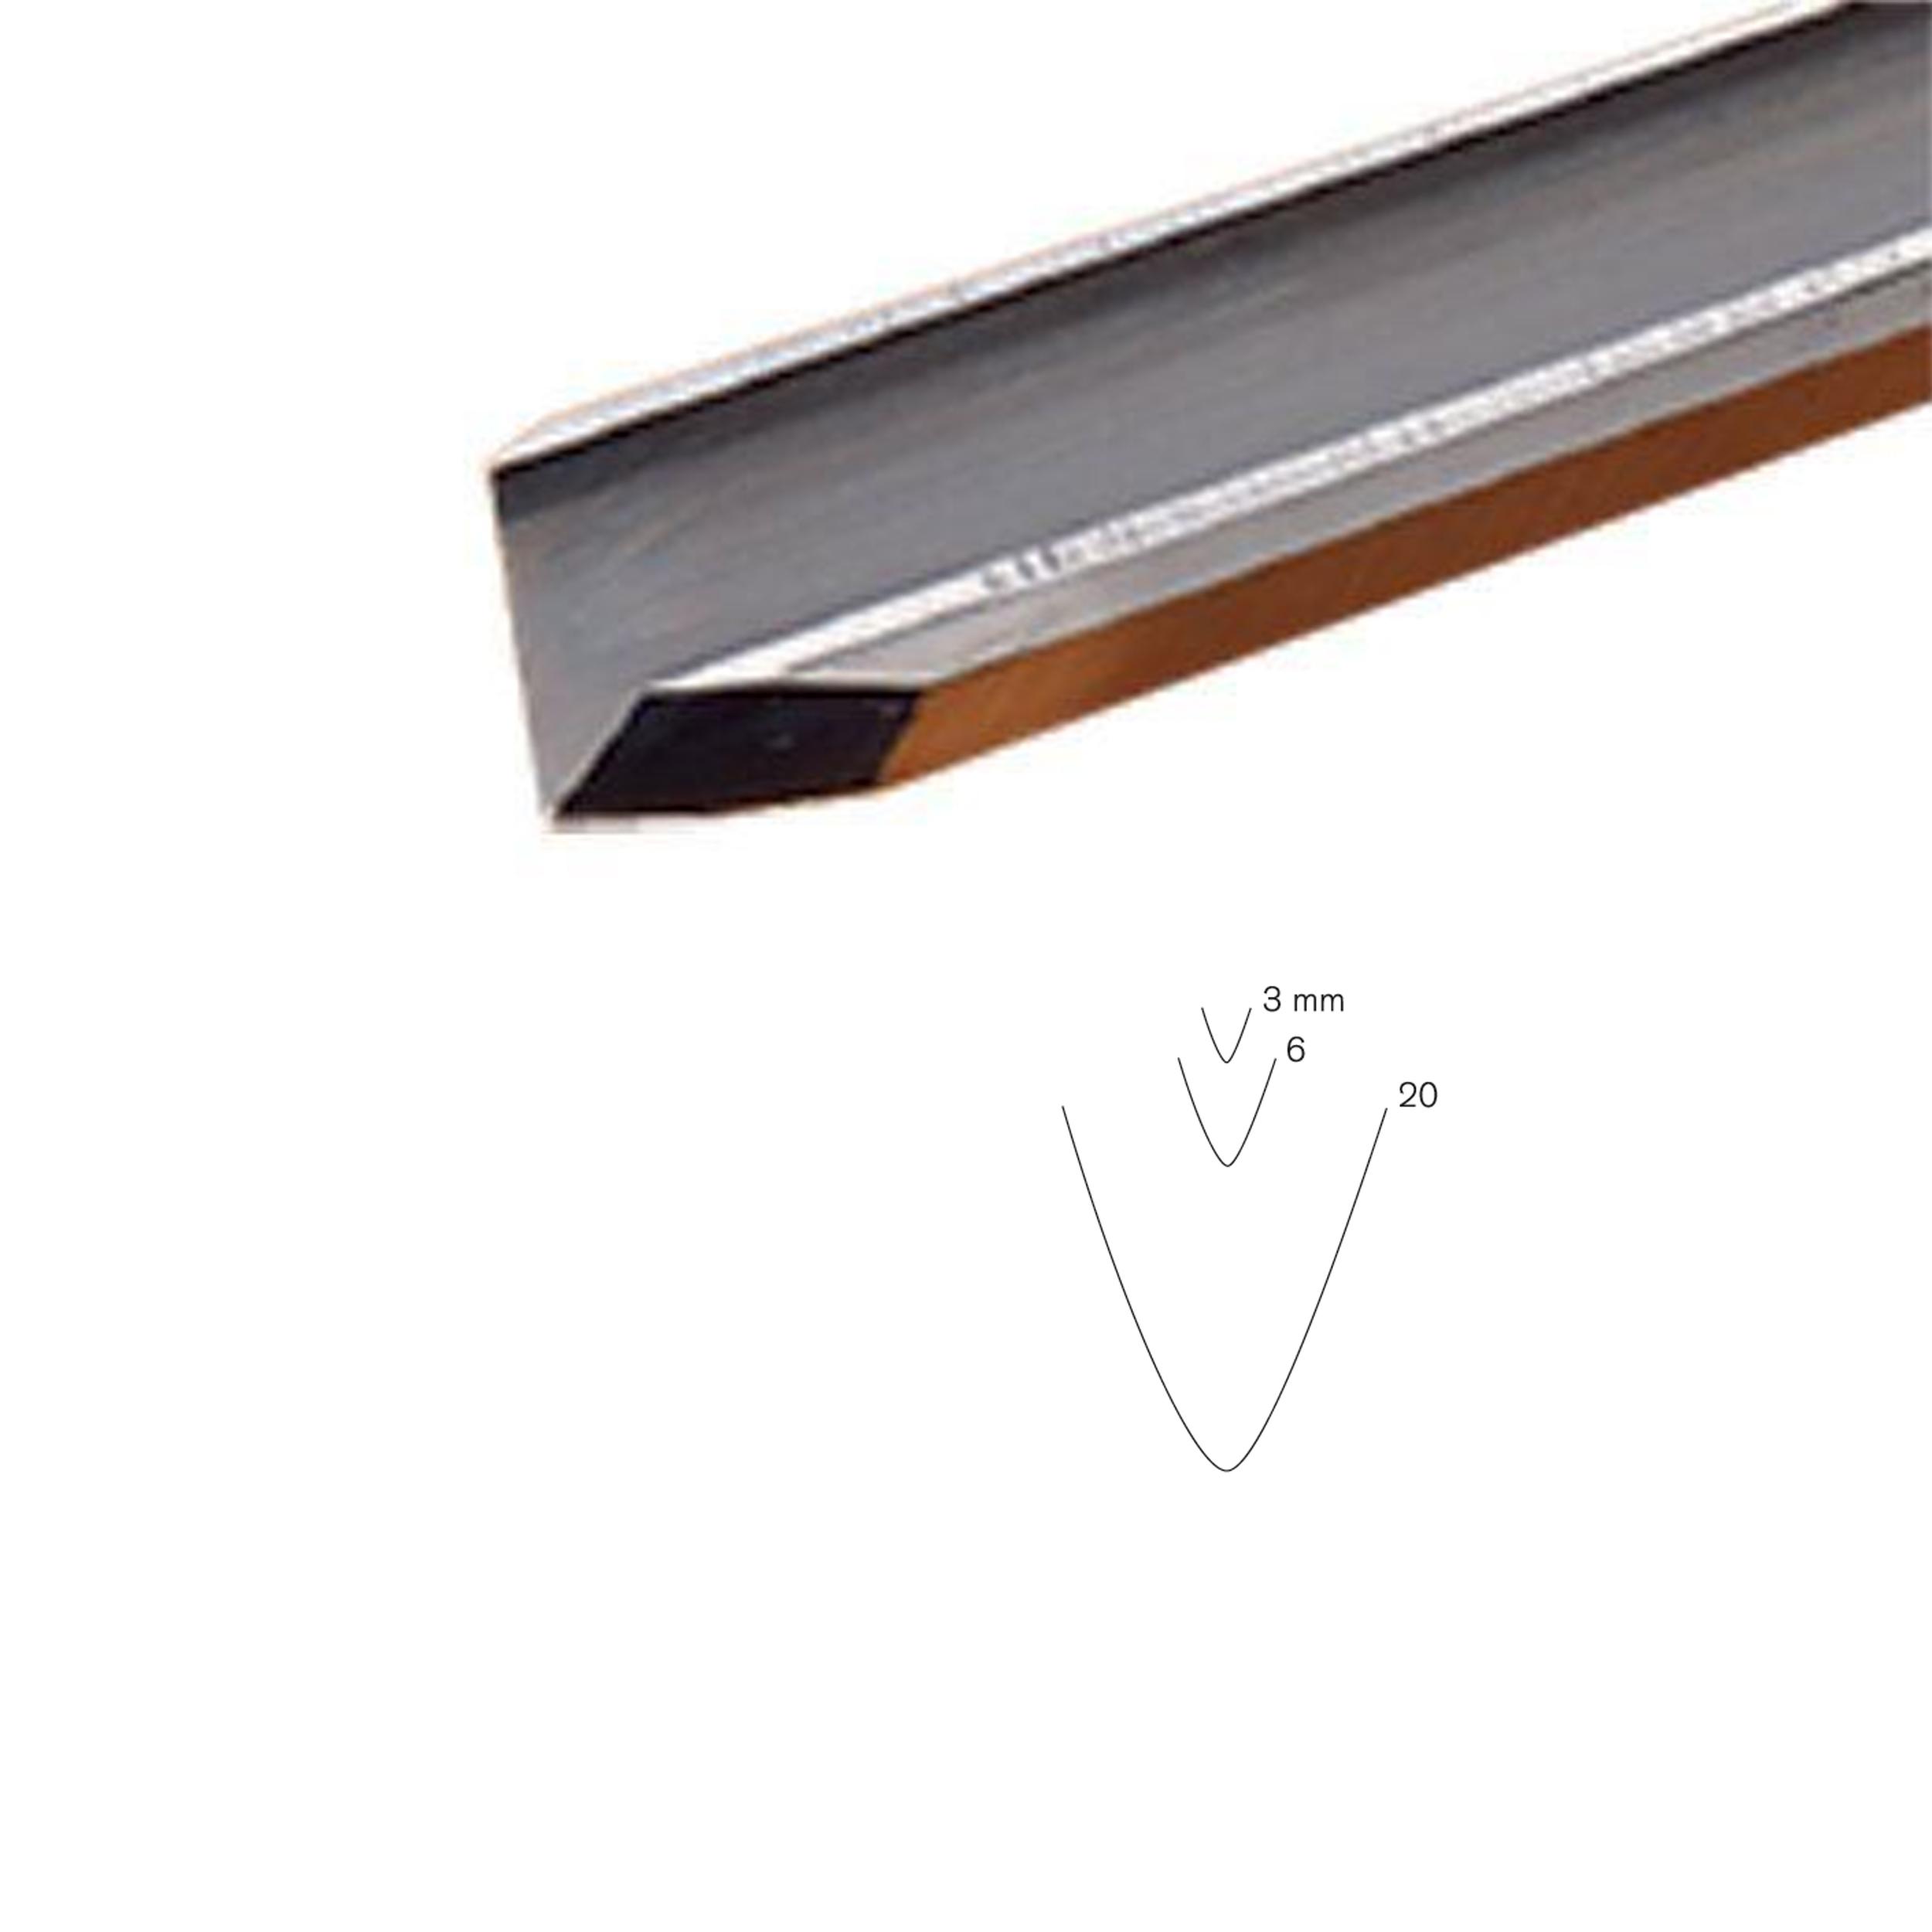 #17 Sweep Stahli V-Parting Tool, 20 mm, Full Size